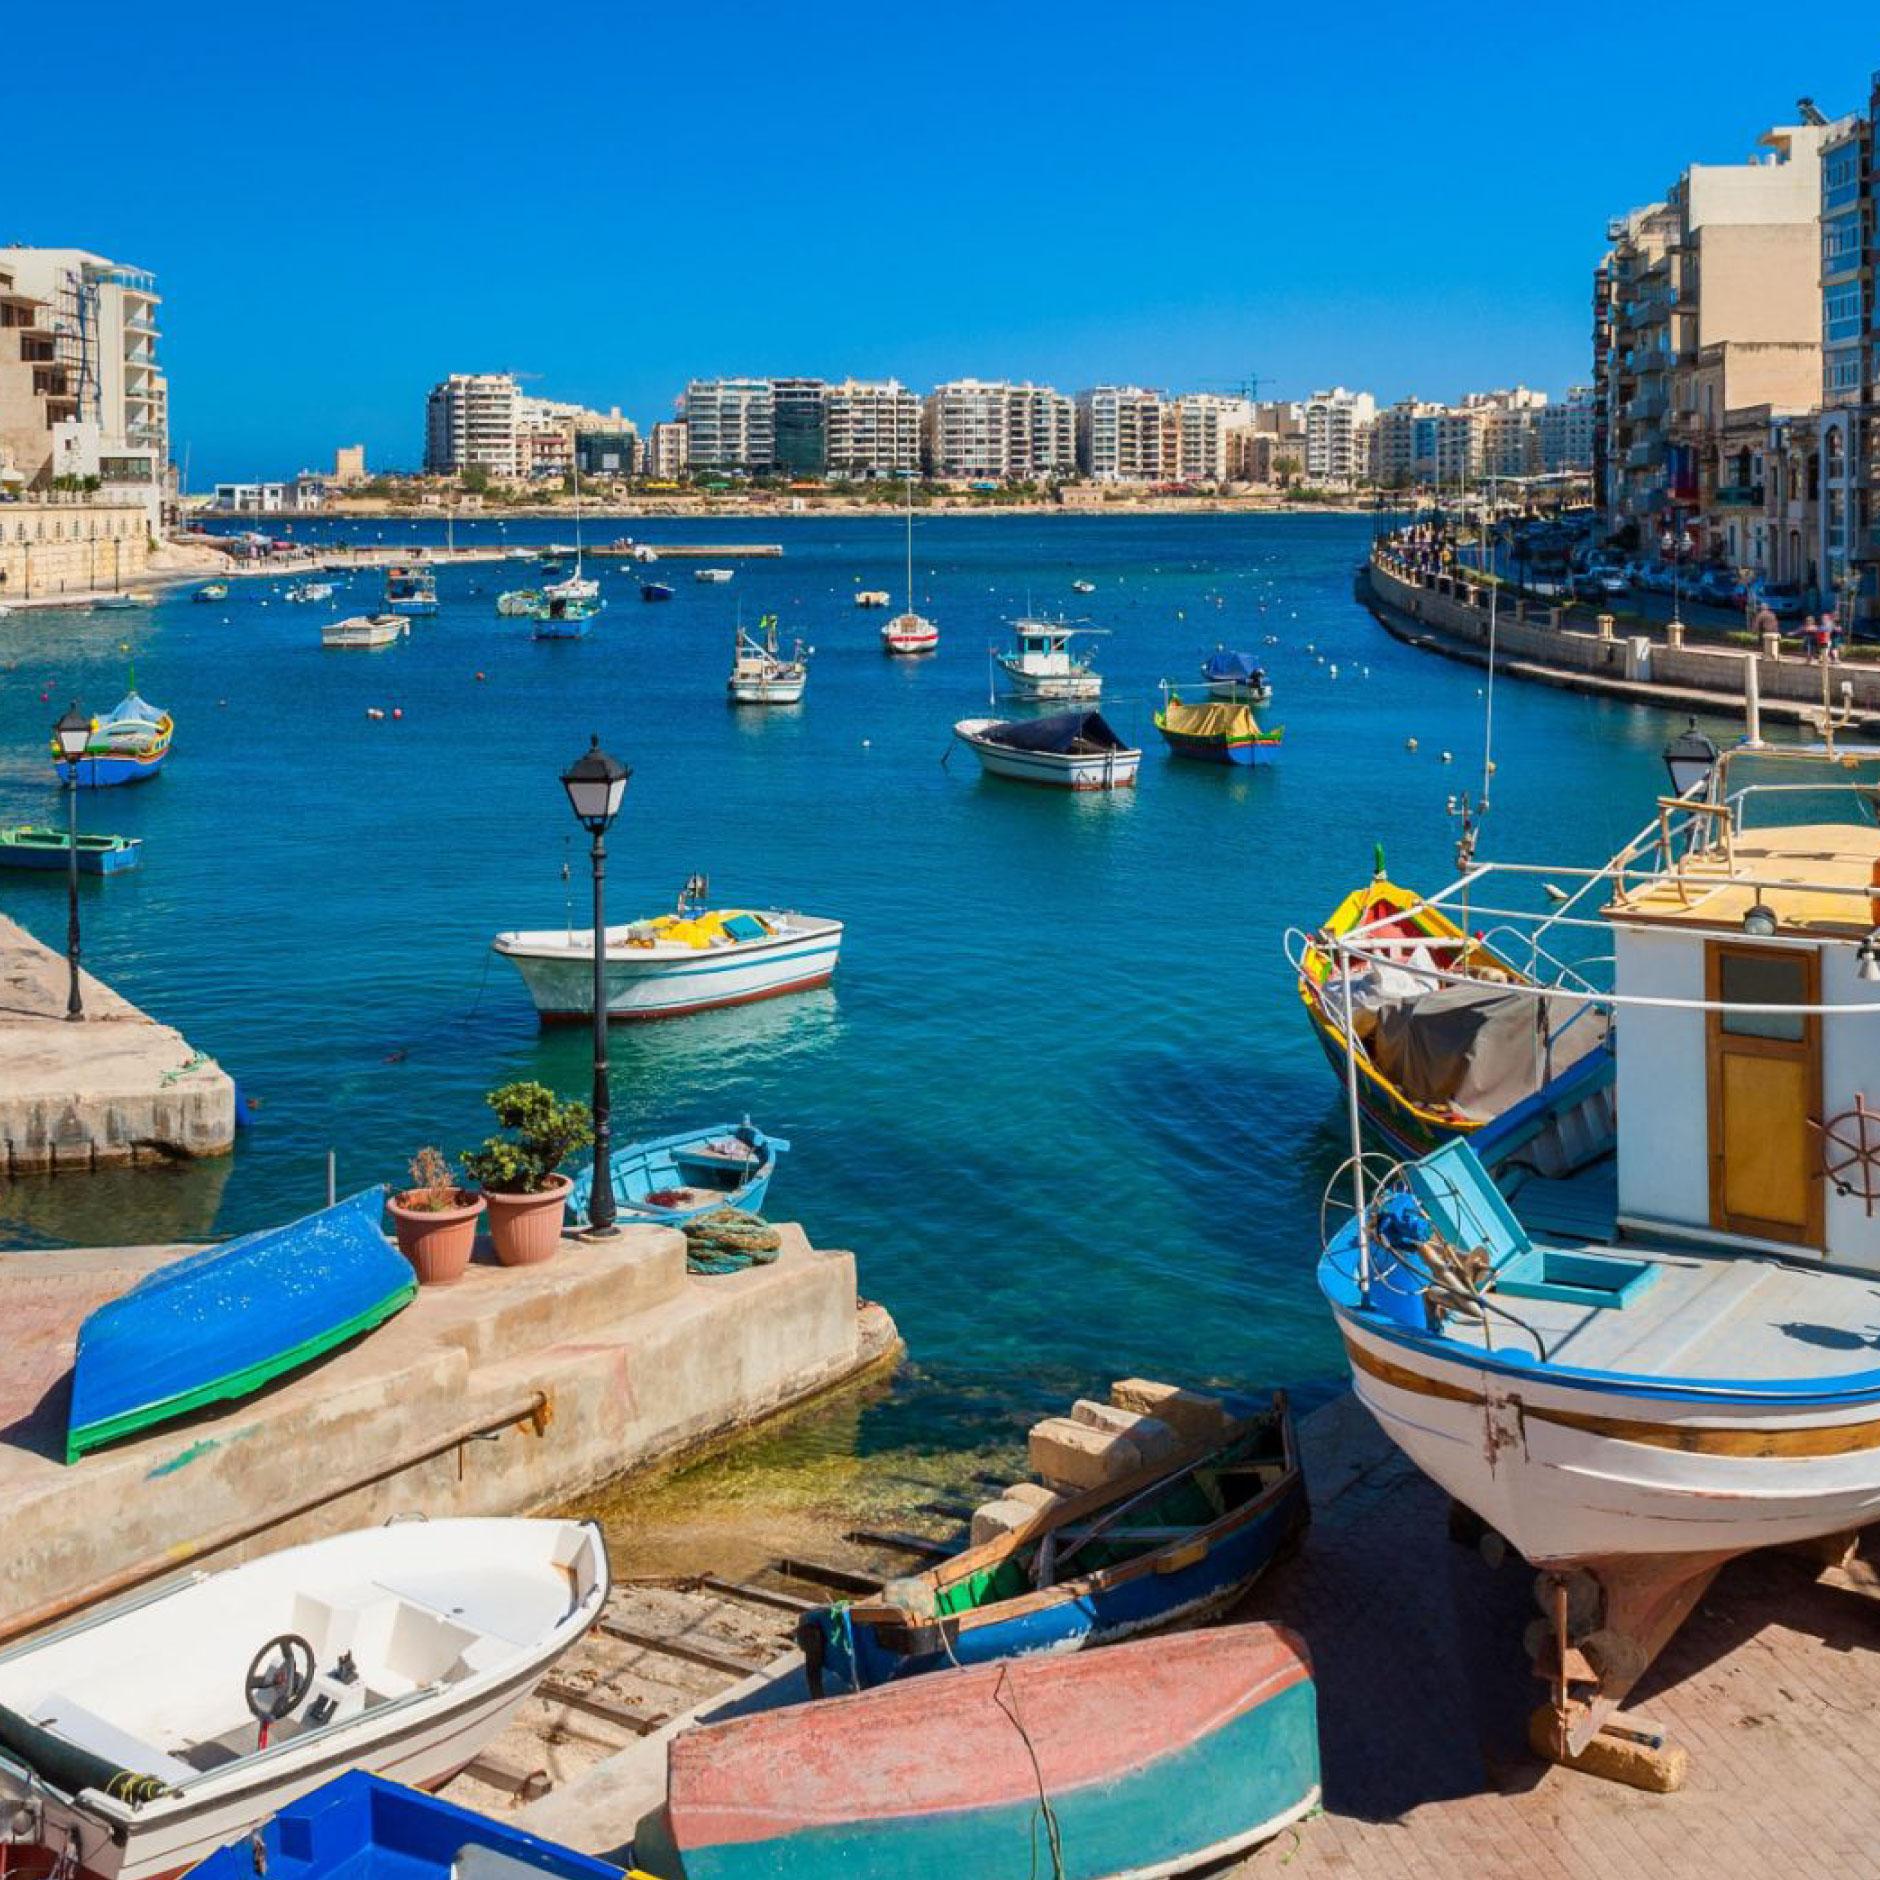 YAM_pics_Malta_01